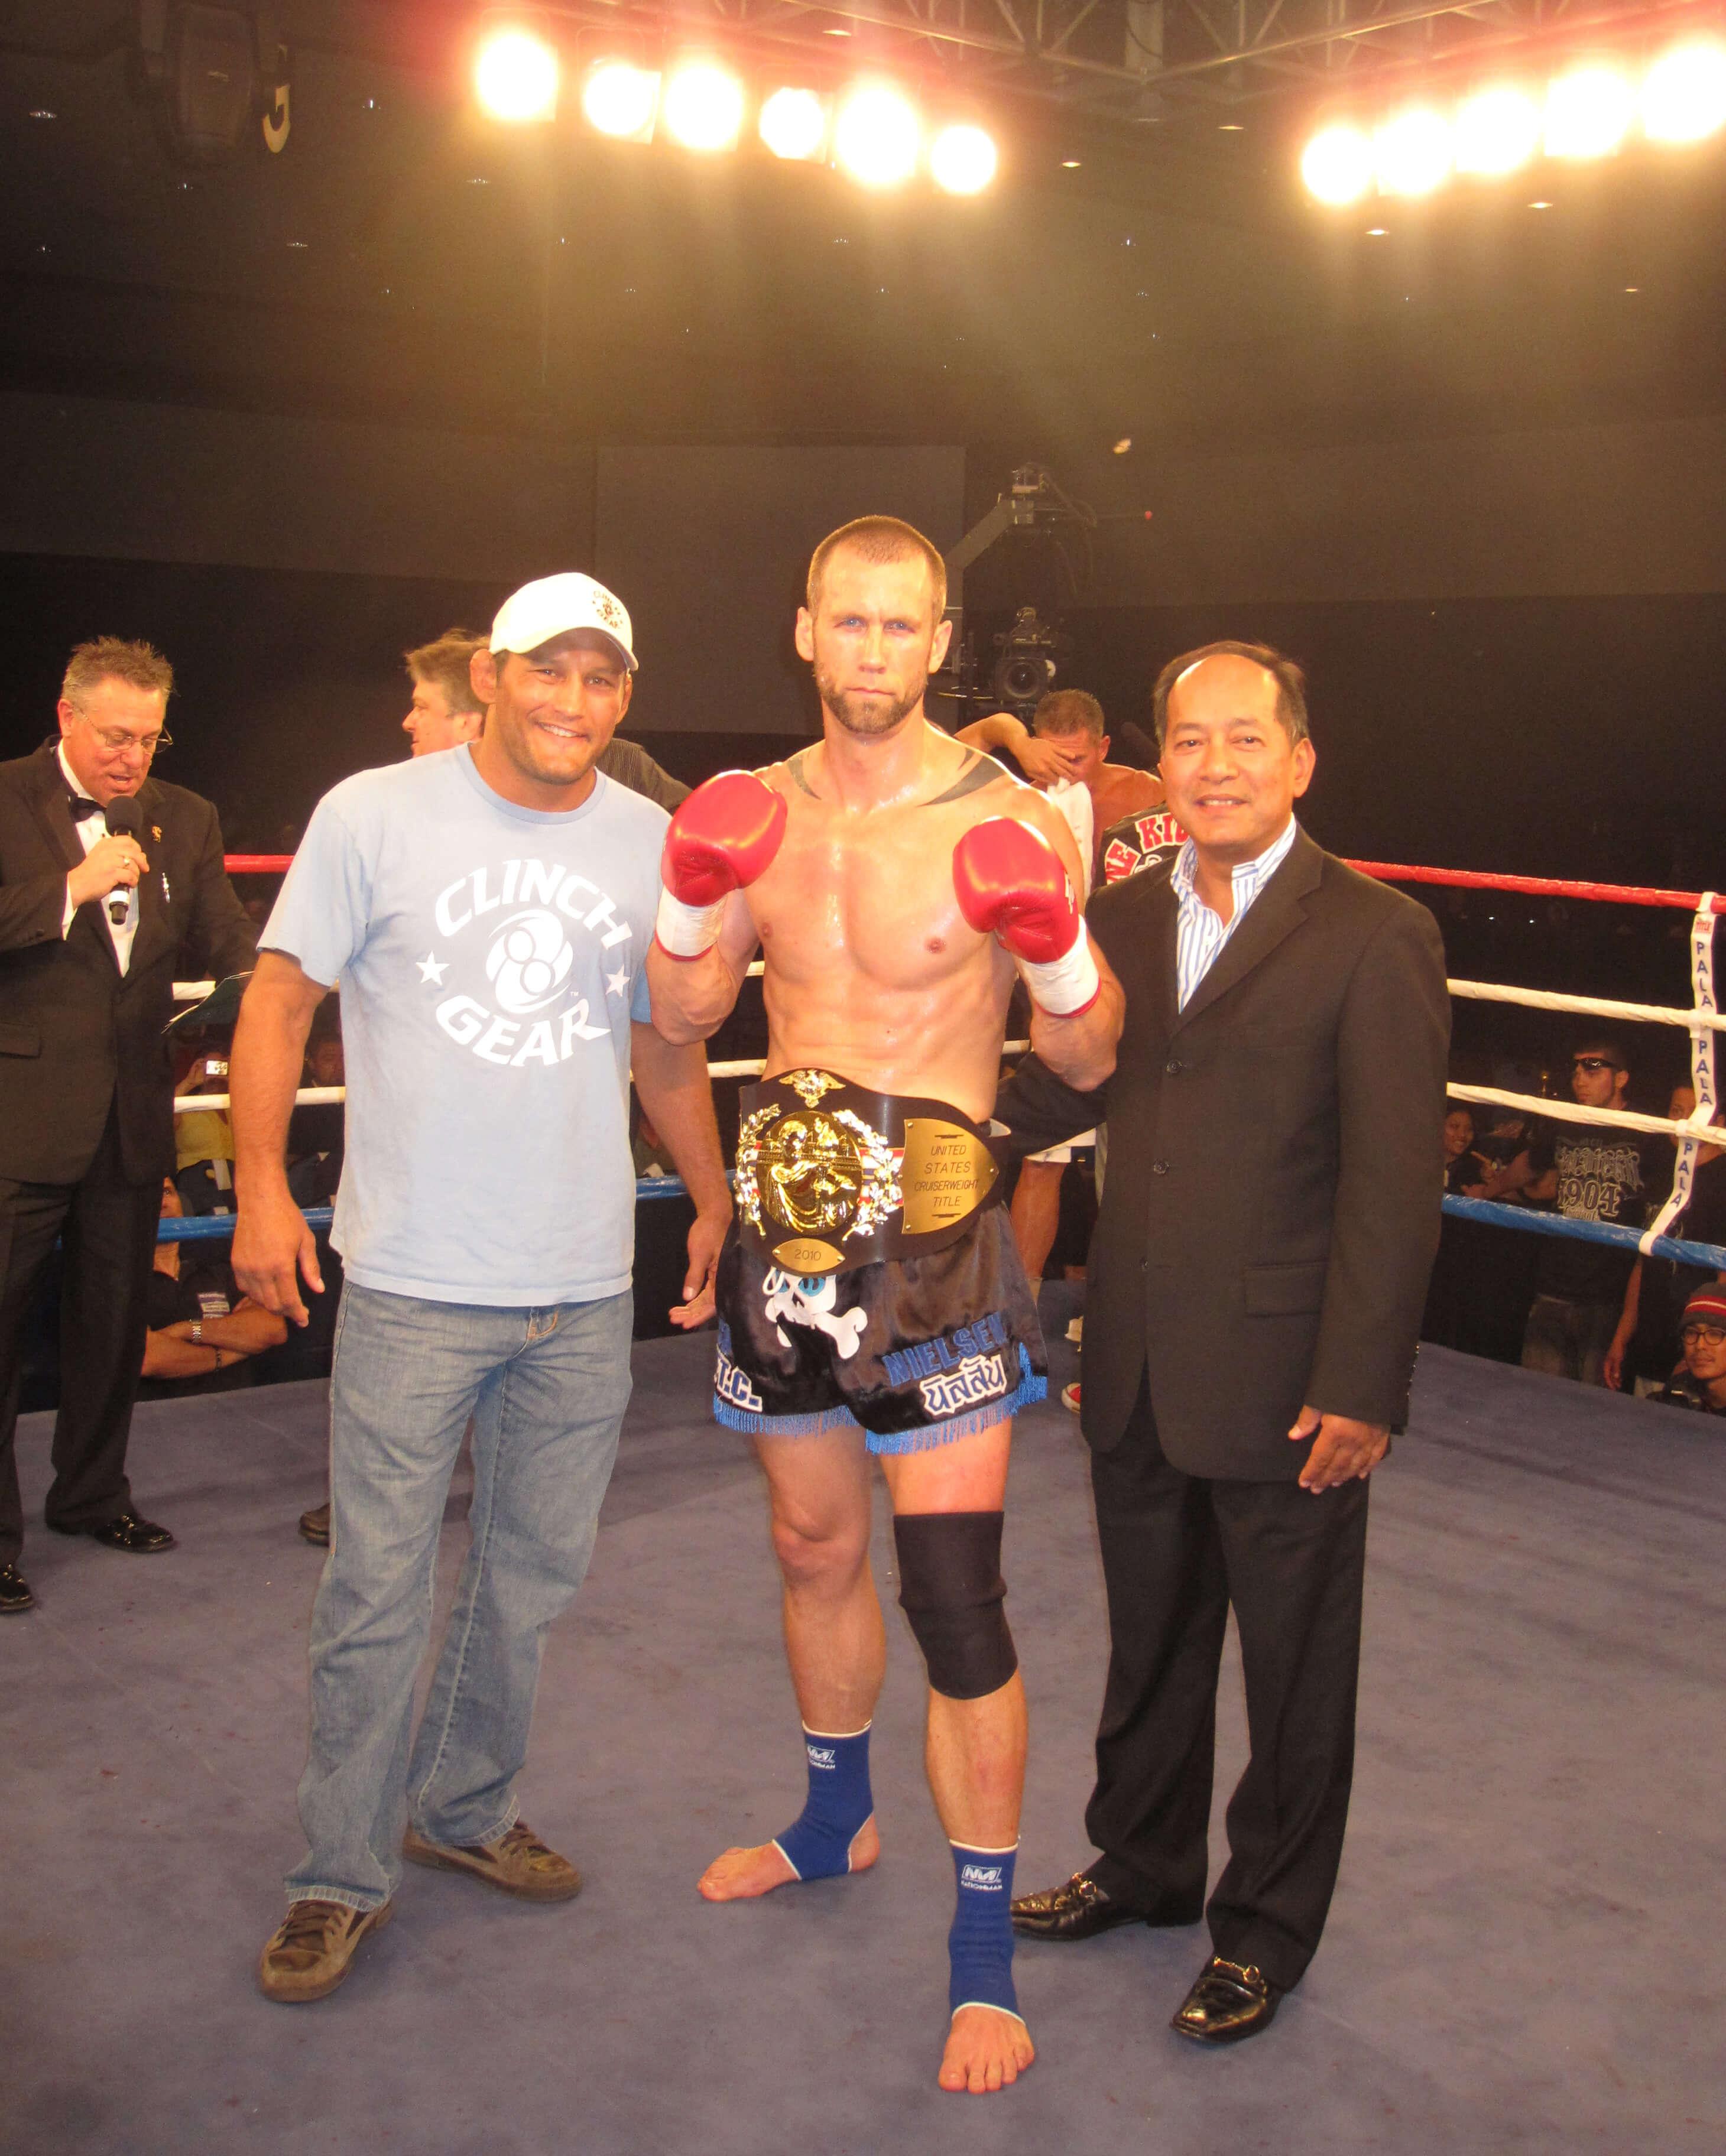 Dave Nielsen US Muay Thai Champion